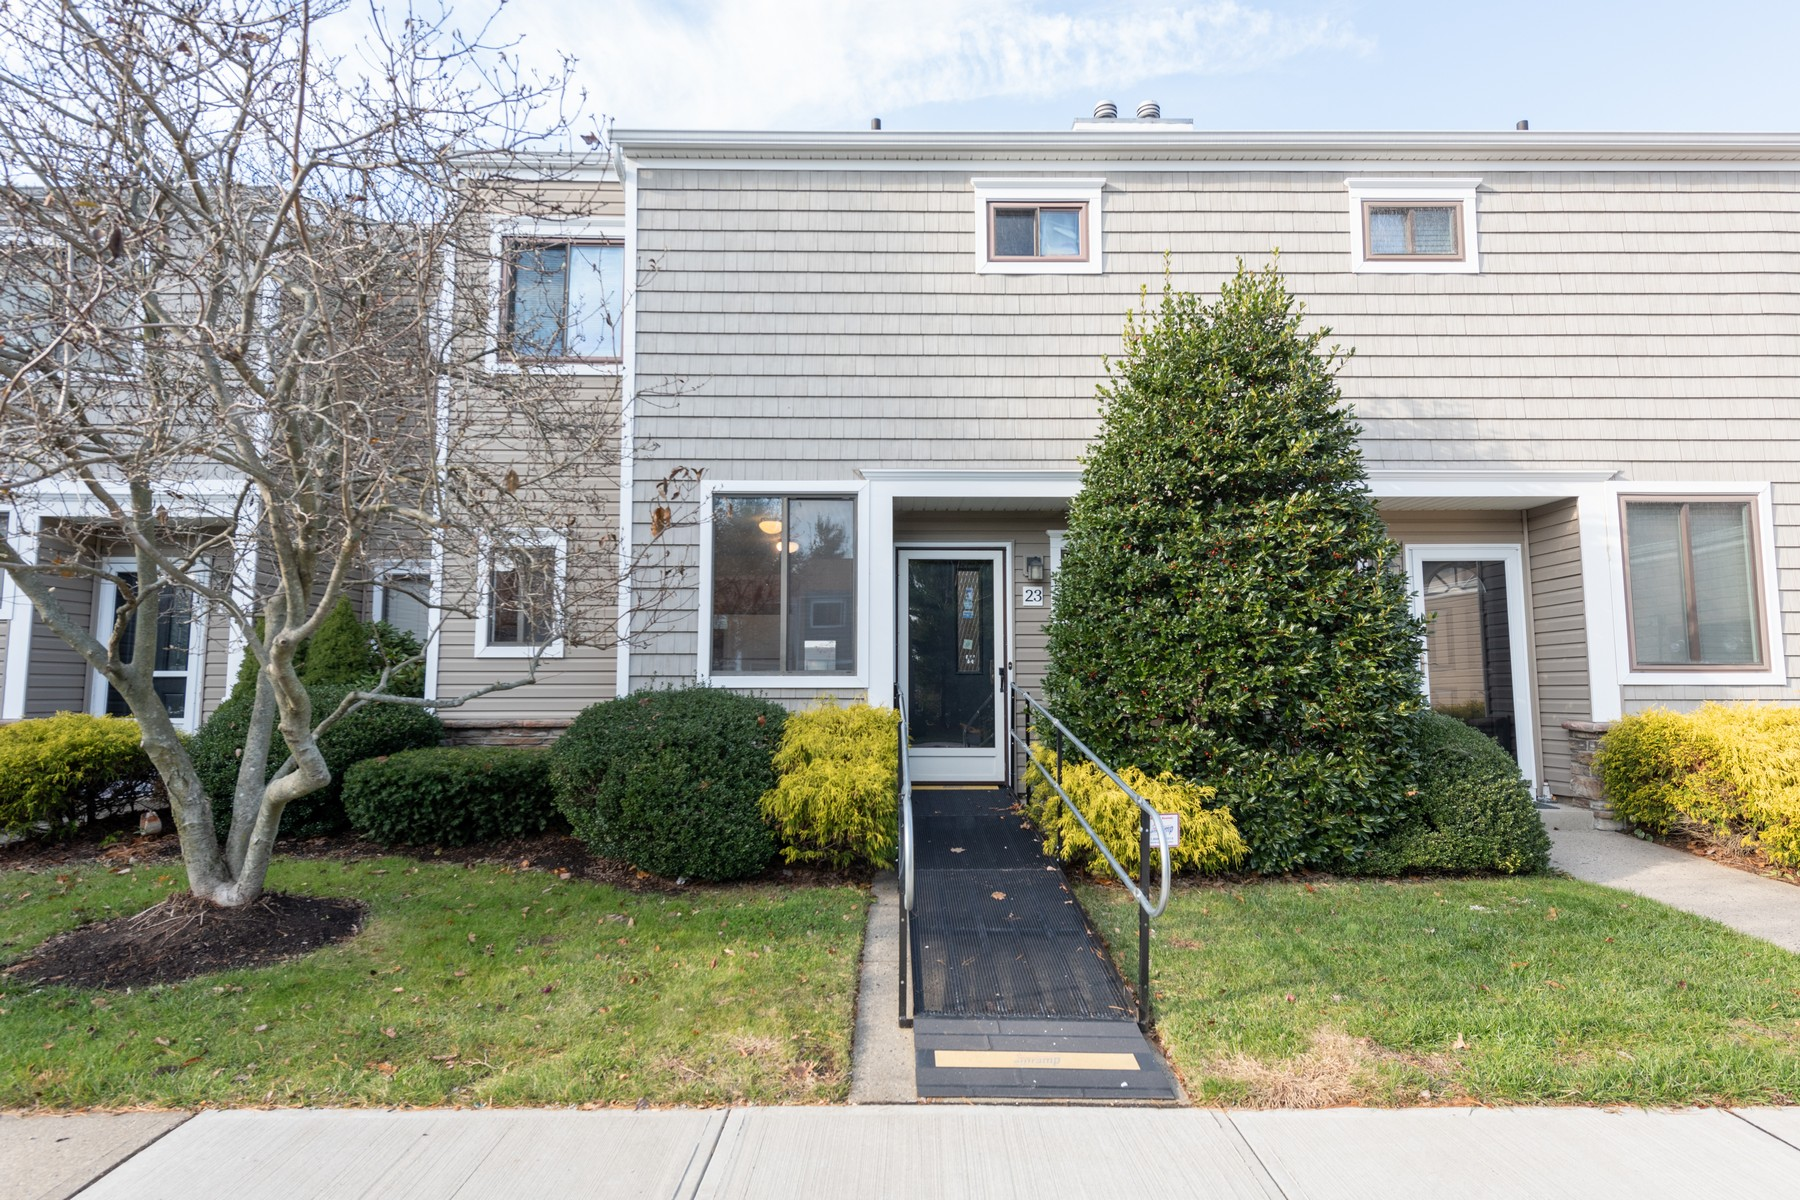 Condominiums for Sale at 23 Iris Court, Tinton Falls Tinton Falls, New Jersey 07724 United States